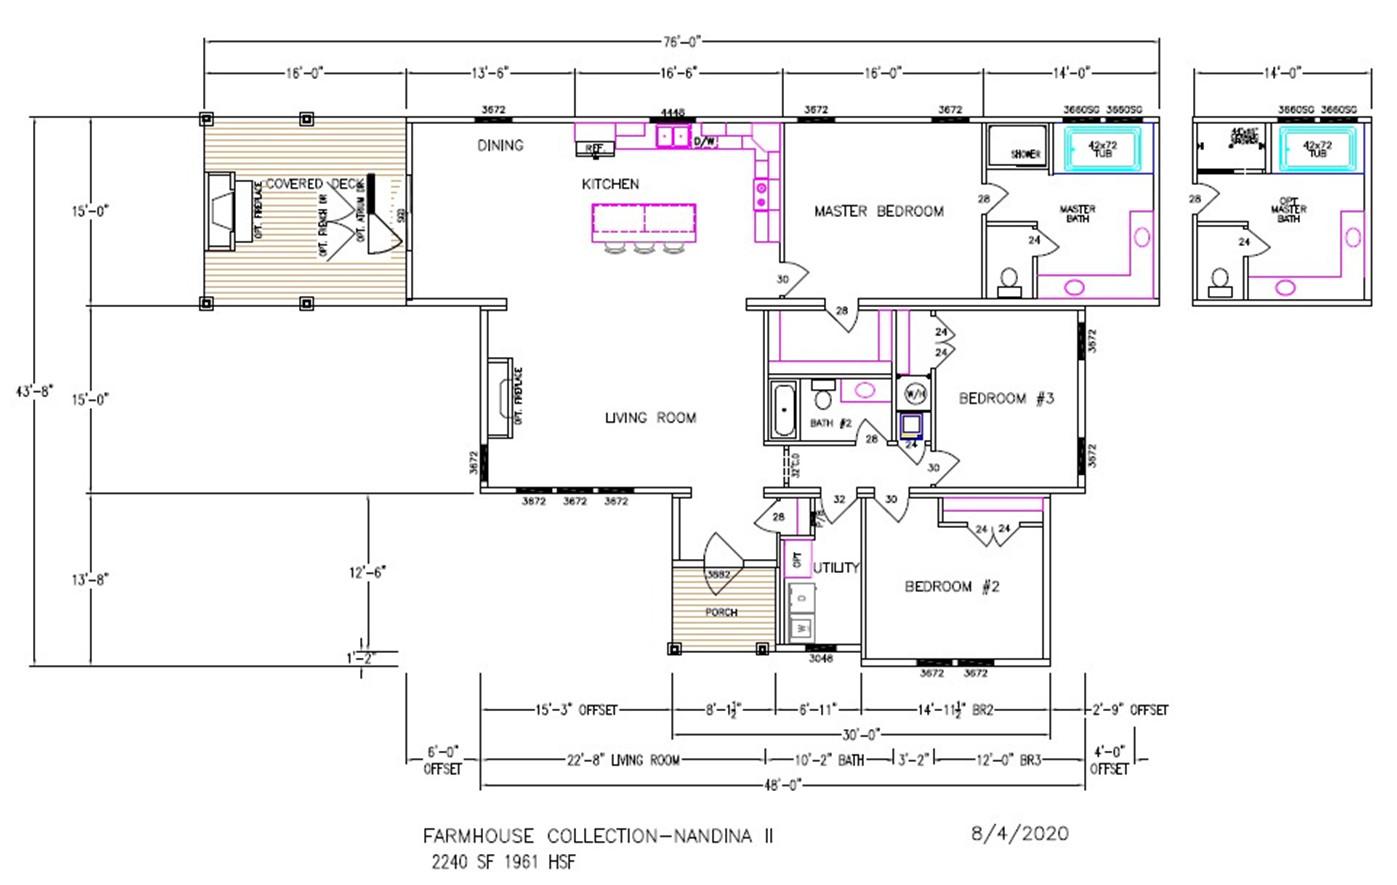 Nandina II Dimensioned Floorplan